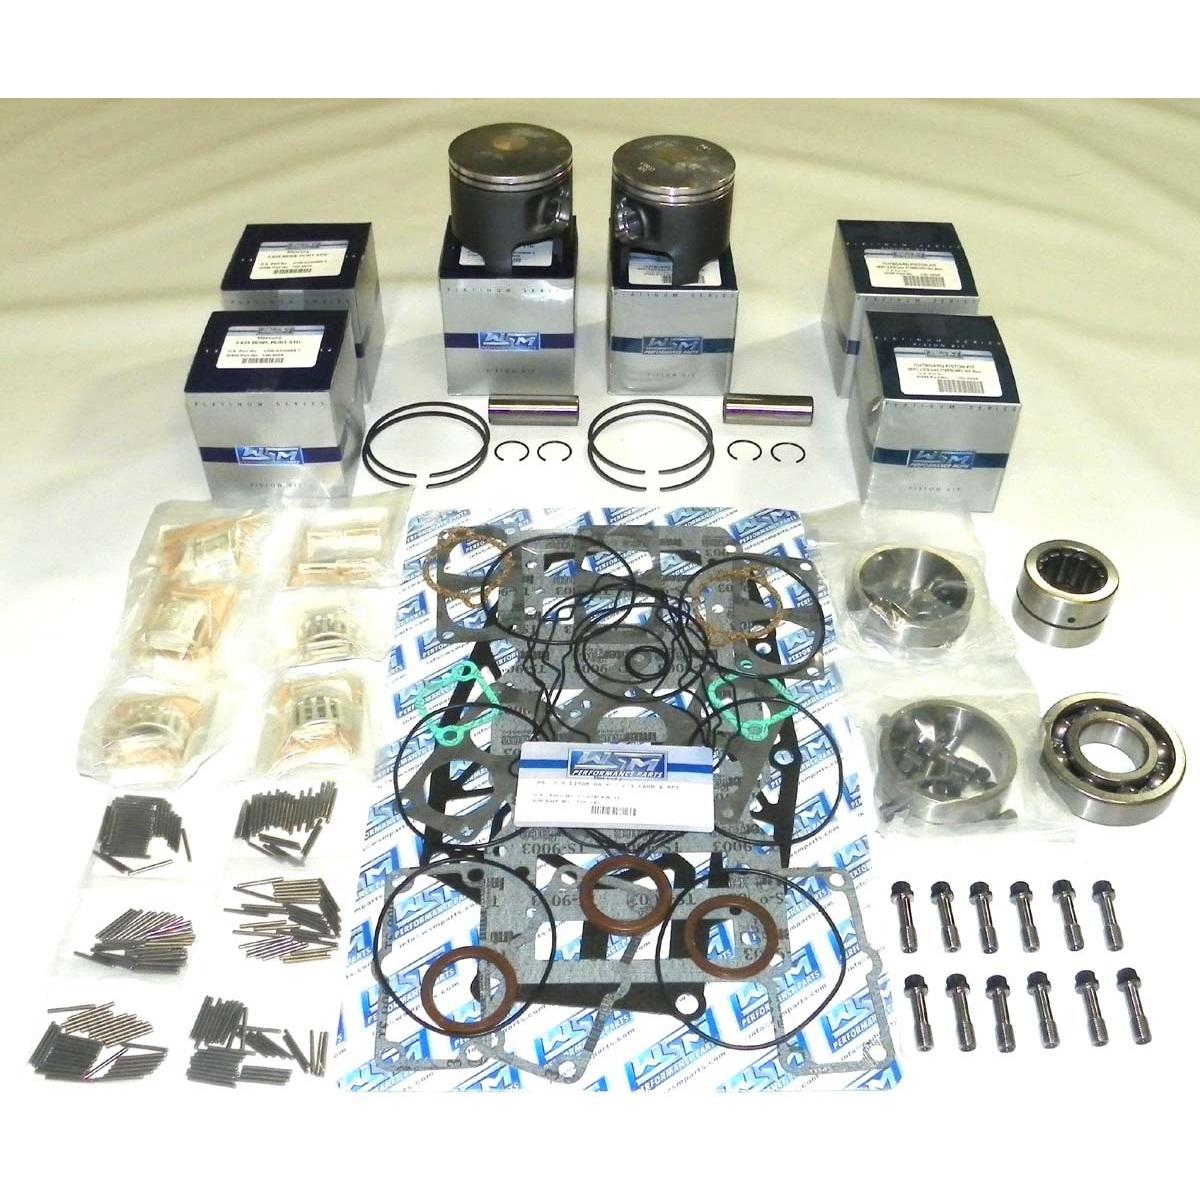 category-merc-6-cyl-rebuild-kits.jpg